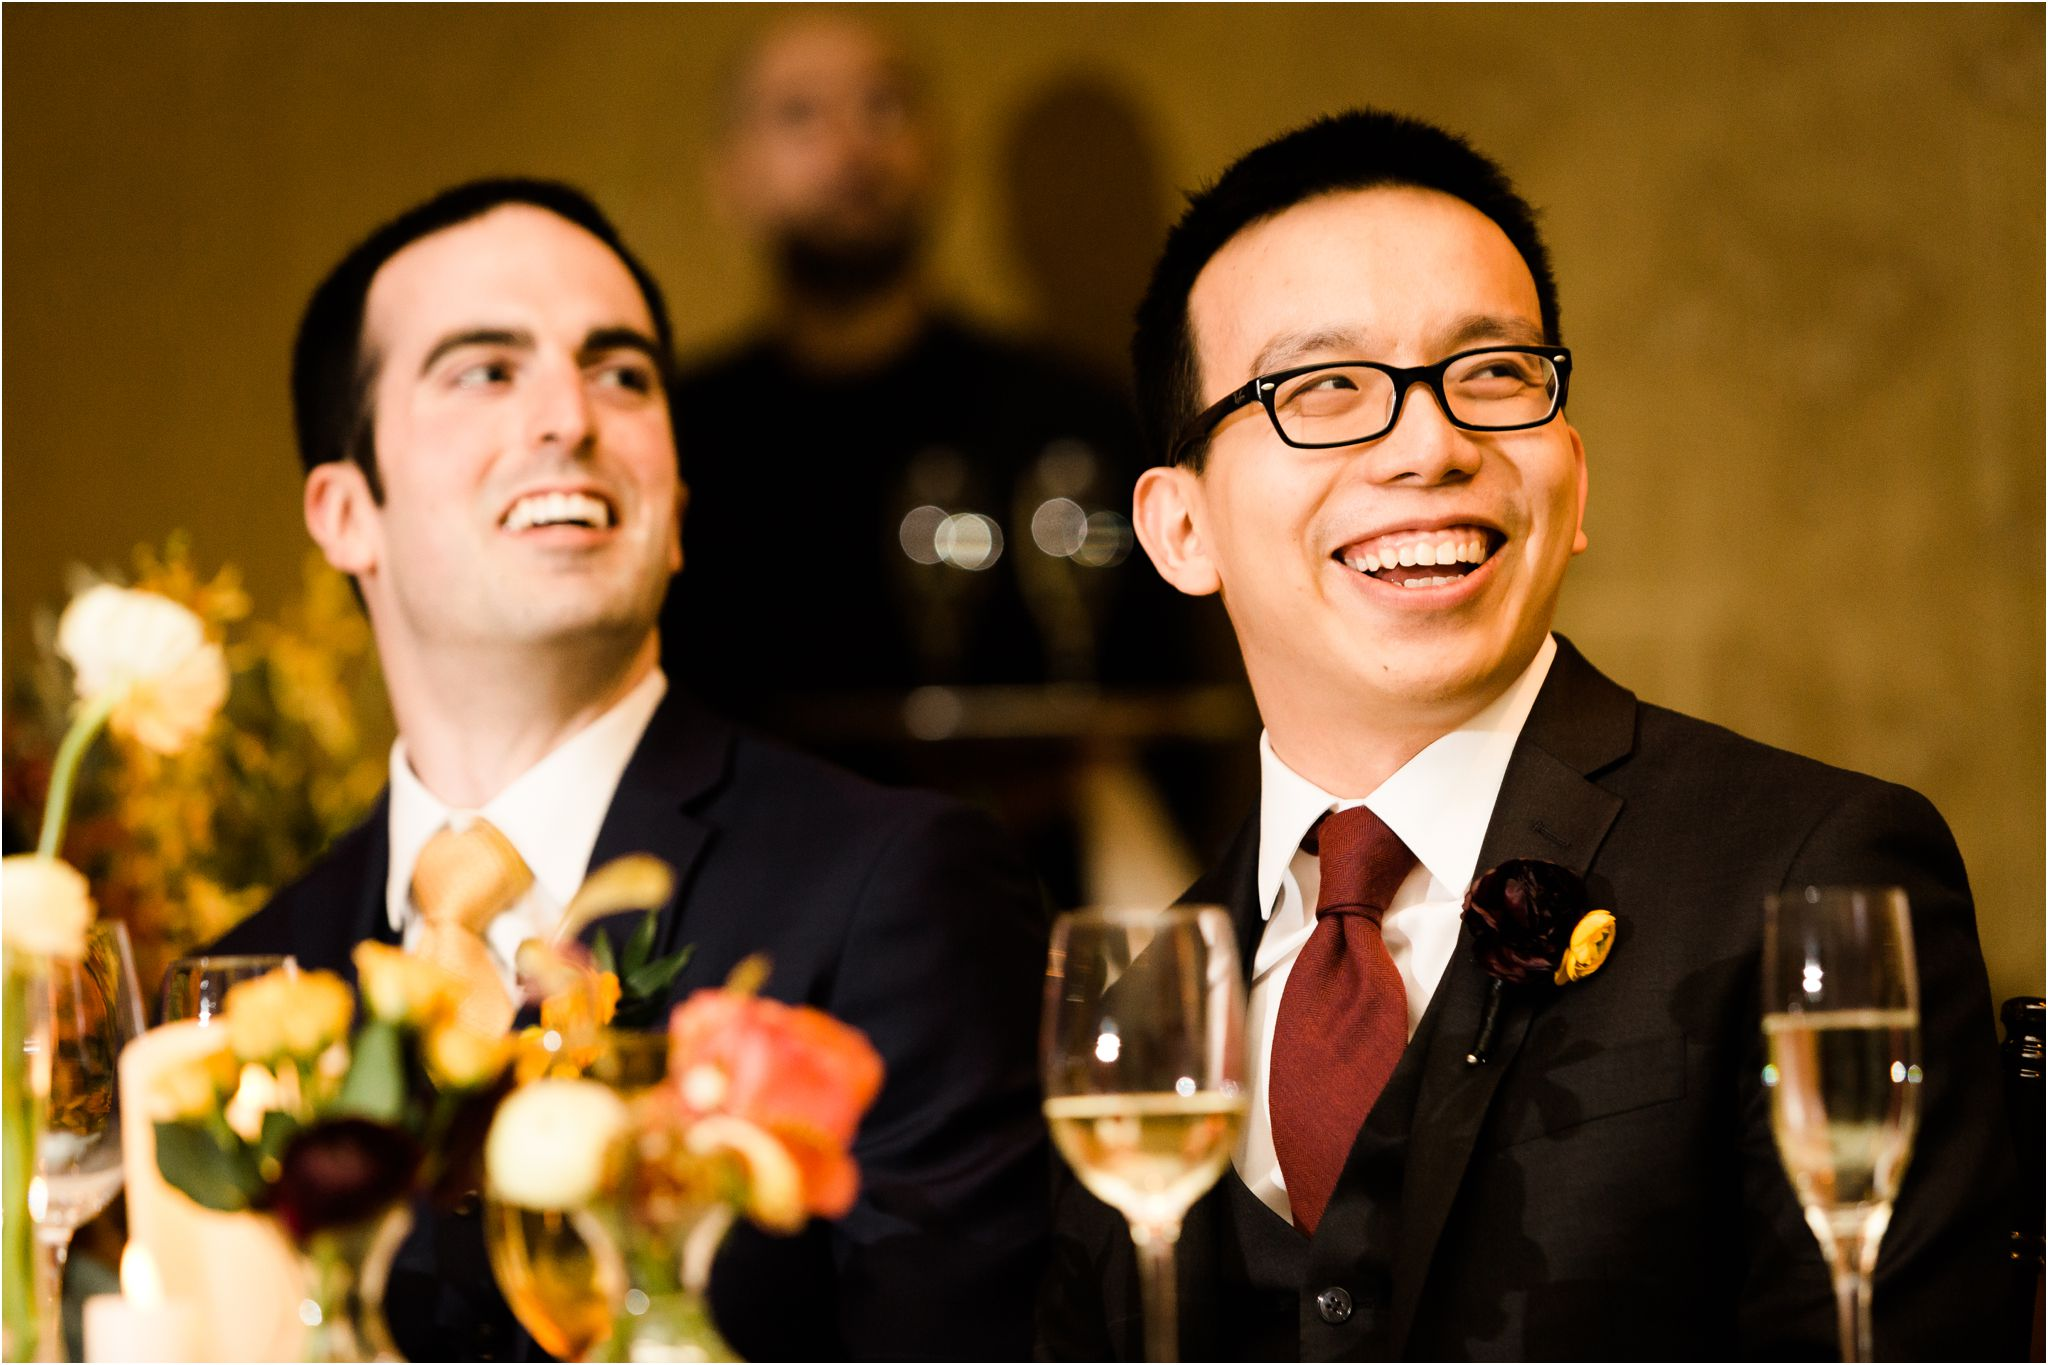 mandarin_oriental_wedding_photos_00054.JPG